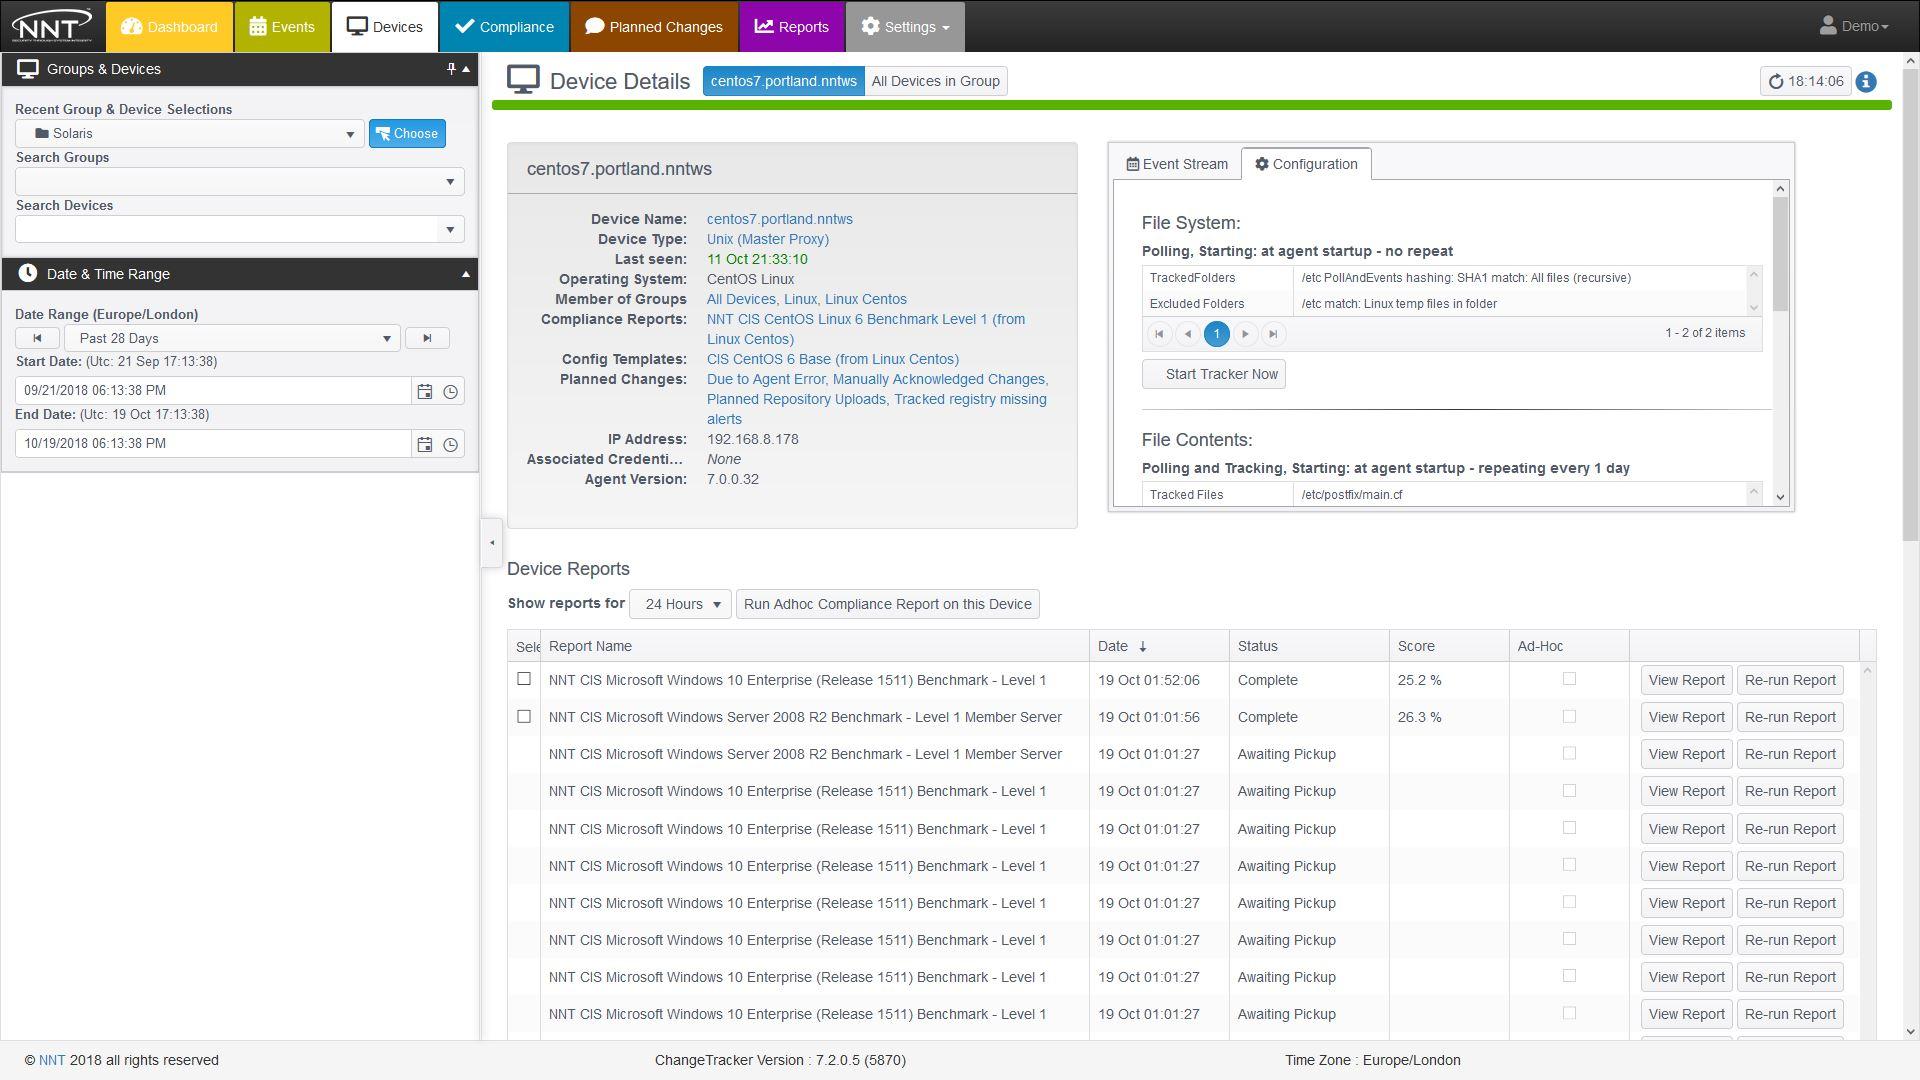 Change Tracker Gen7 R2 Demo - Device Details Page